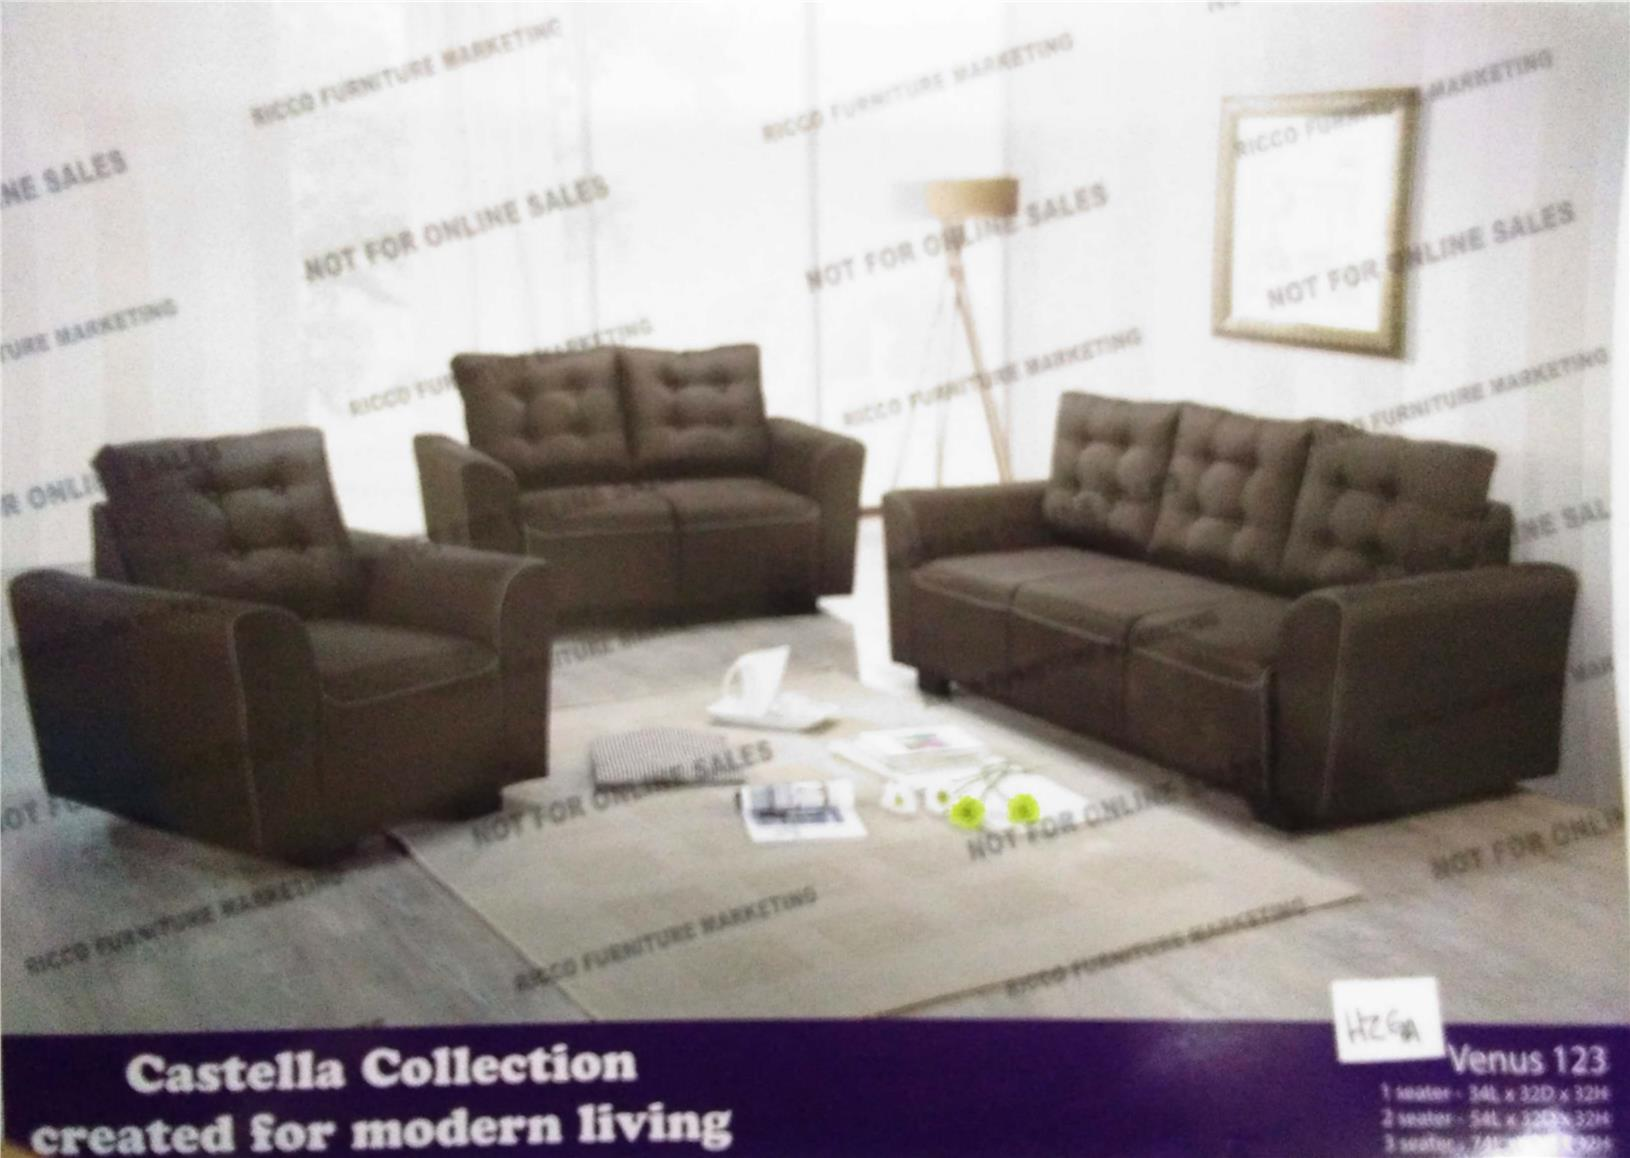 Installment Plan Sofa Set 1 2 3 Ve End 1 14 2019 3 15 Pm